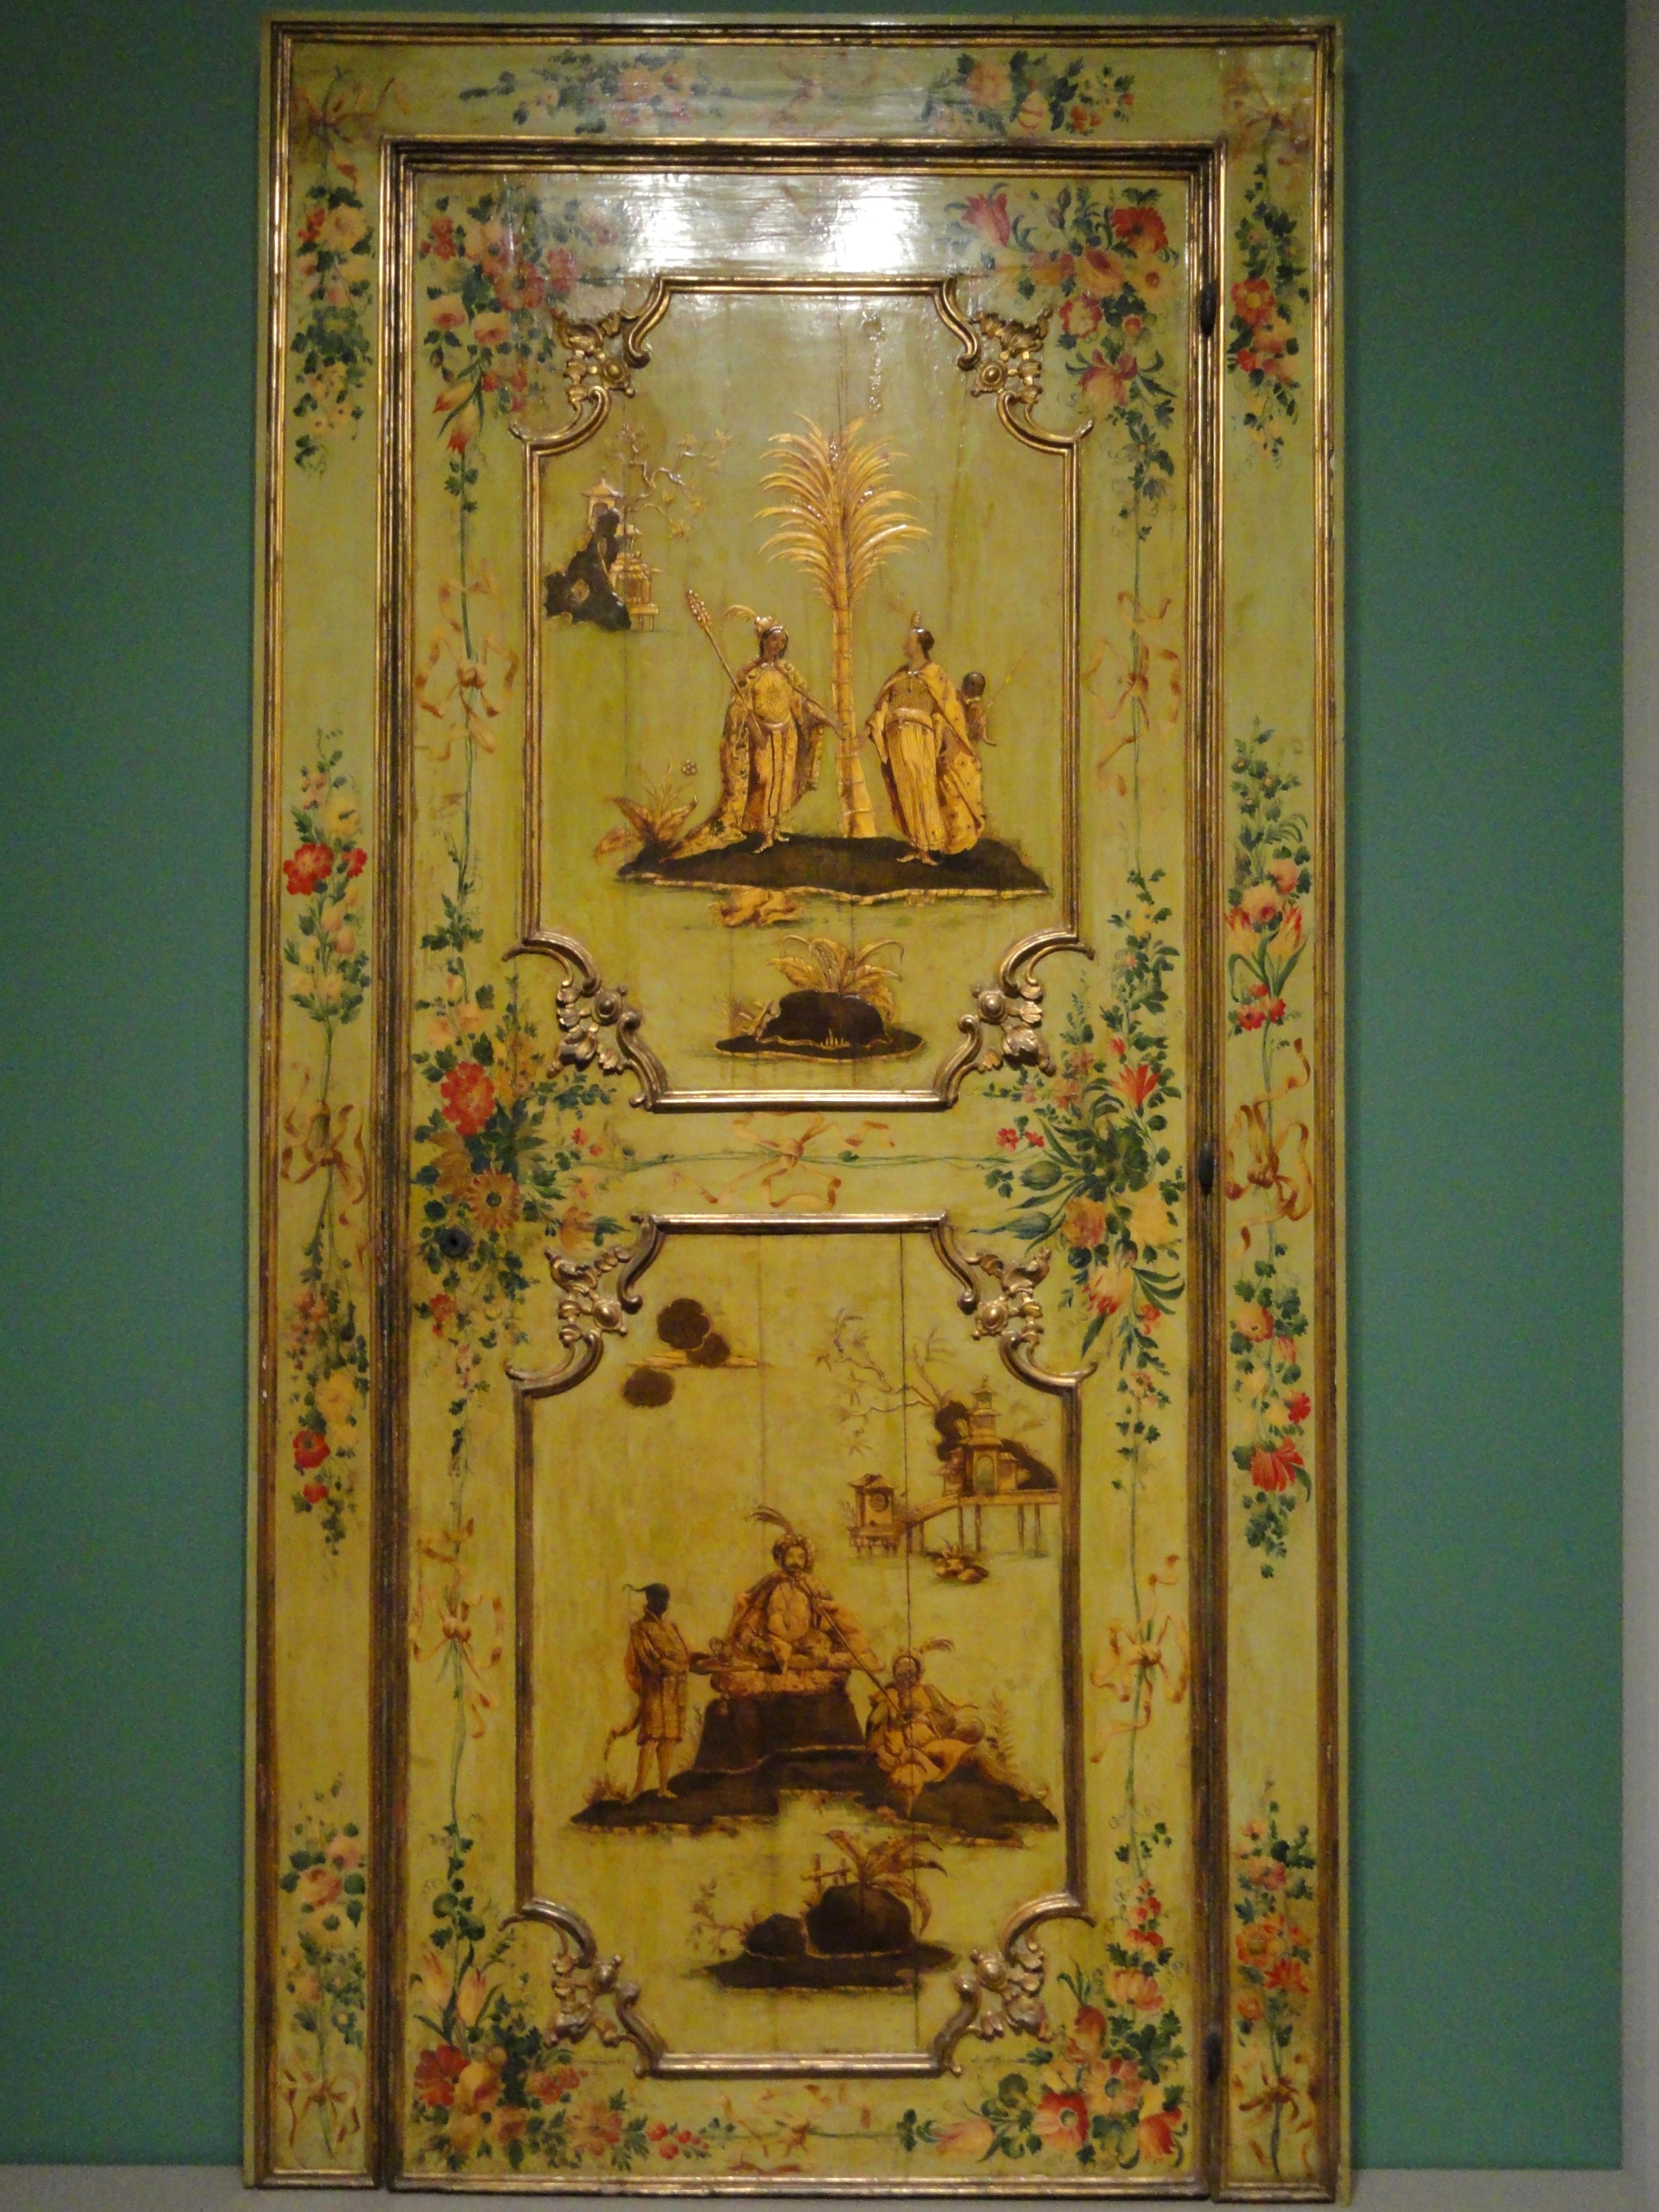 FileDoor c. 1750 designed by Giovanni Battista Tiepolo Italy & File:Door c. 1750 designed by Giovanni Battista Tiepolo Italy ...